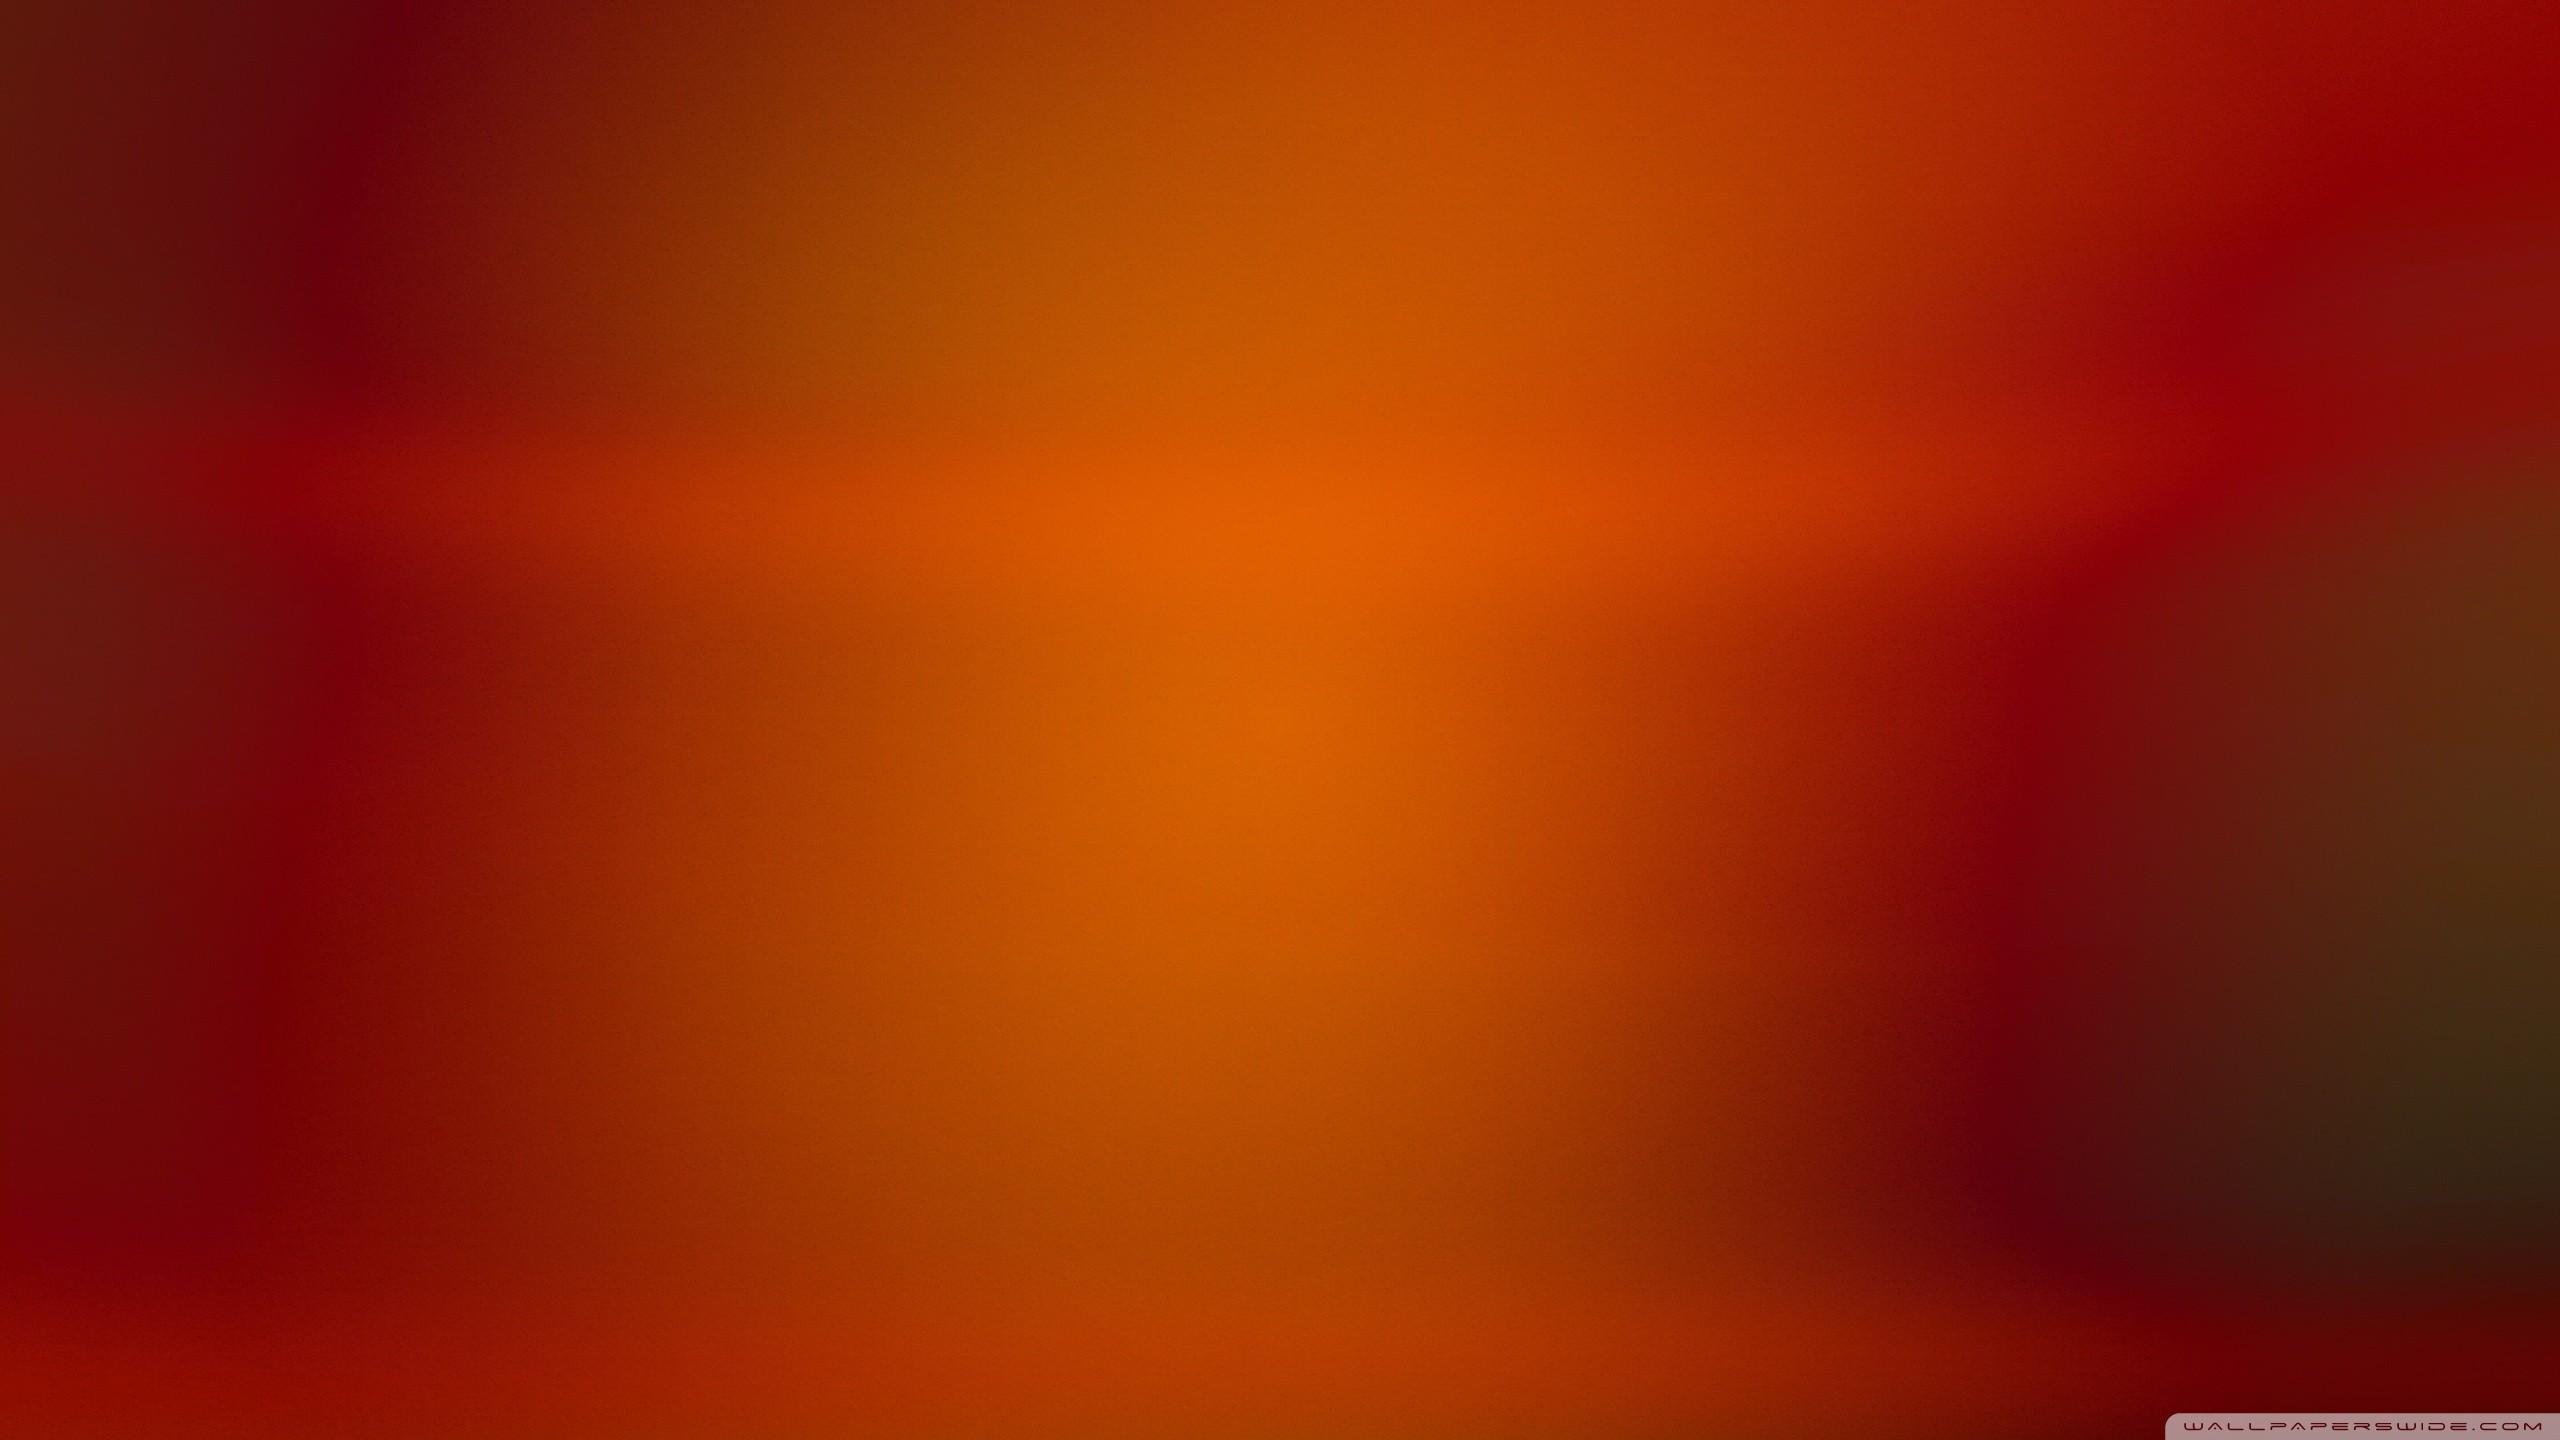 High resolution wallpaper background ID 77700432656